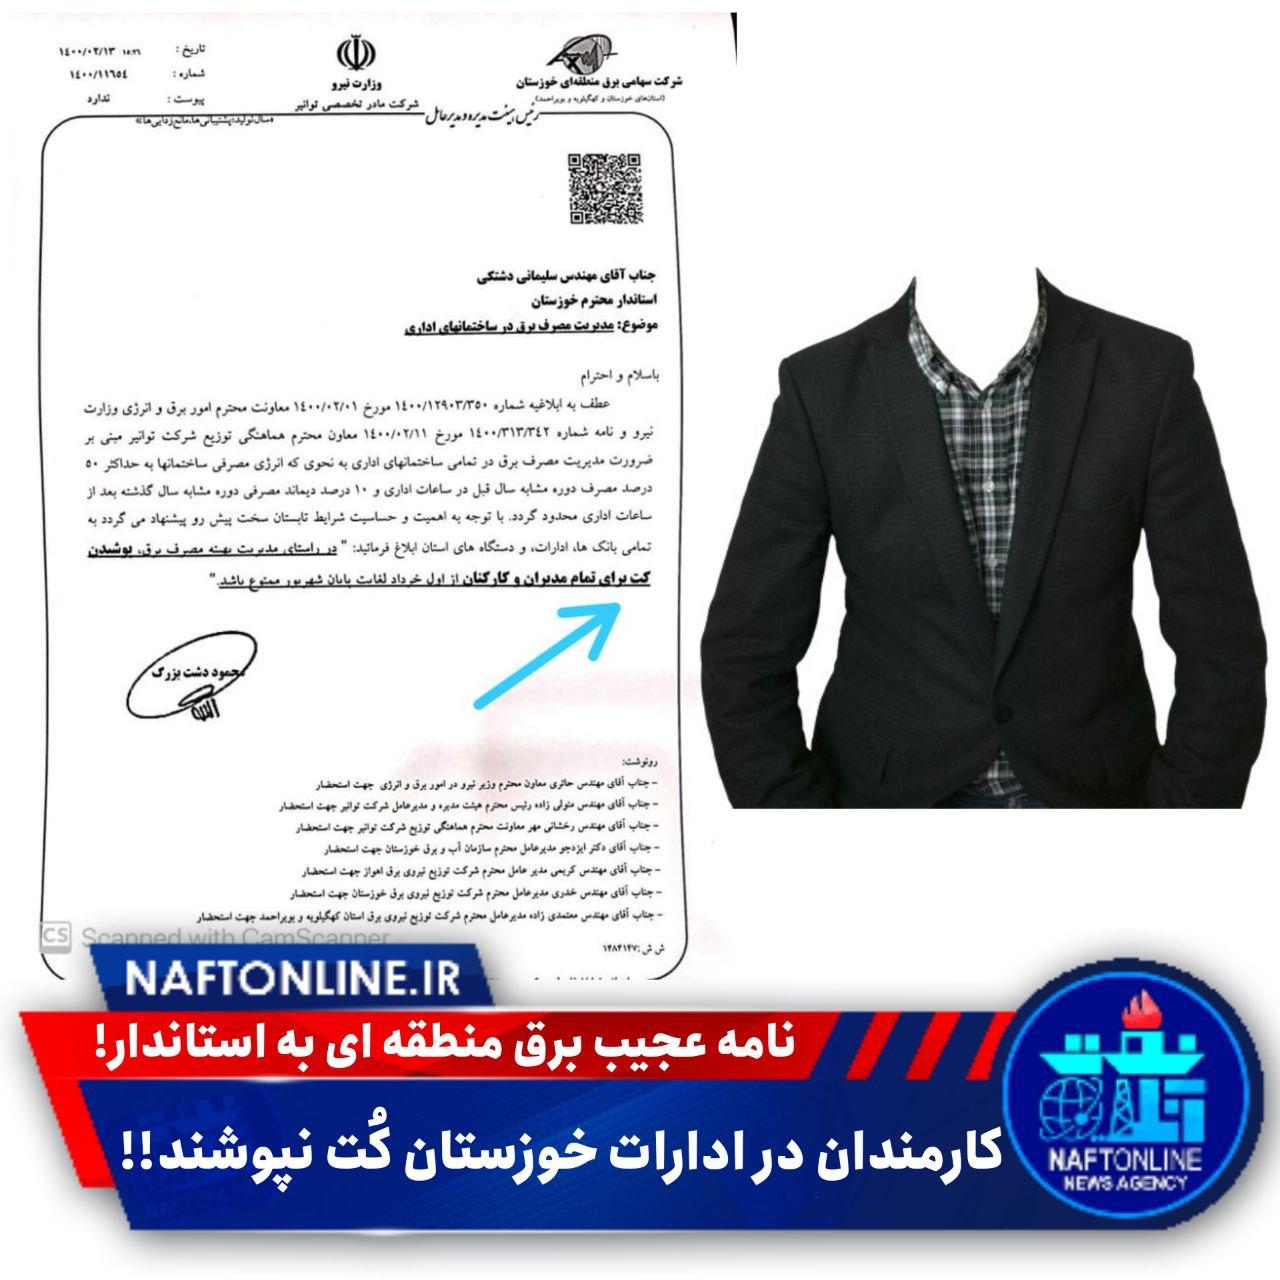 ممنوعیت پوشیدن کت در ادارات